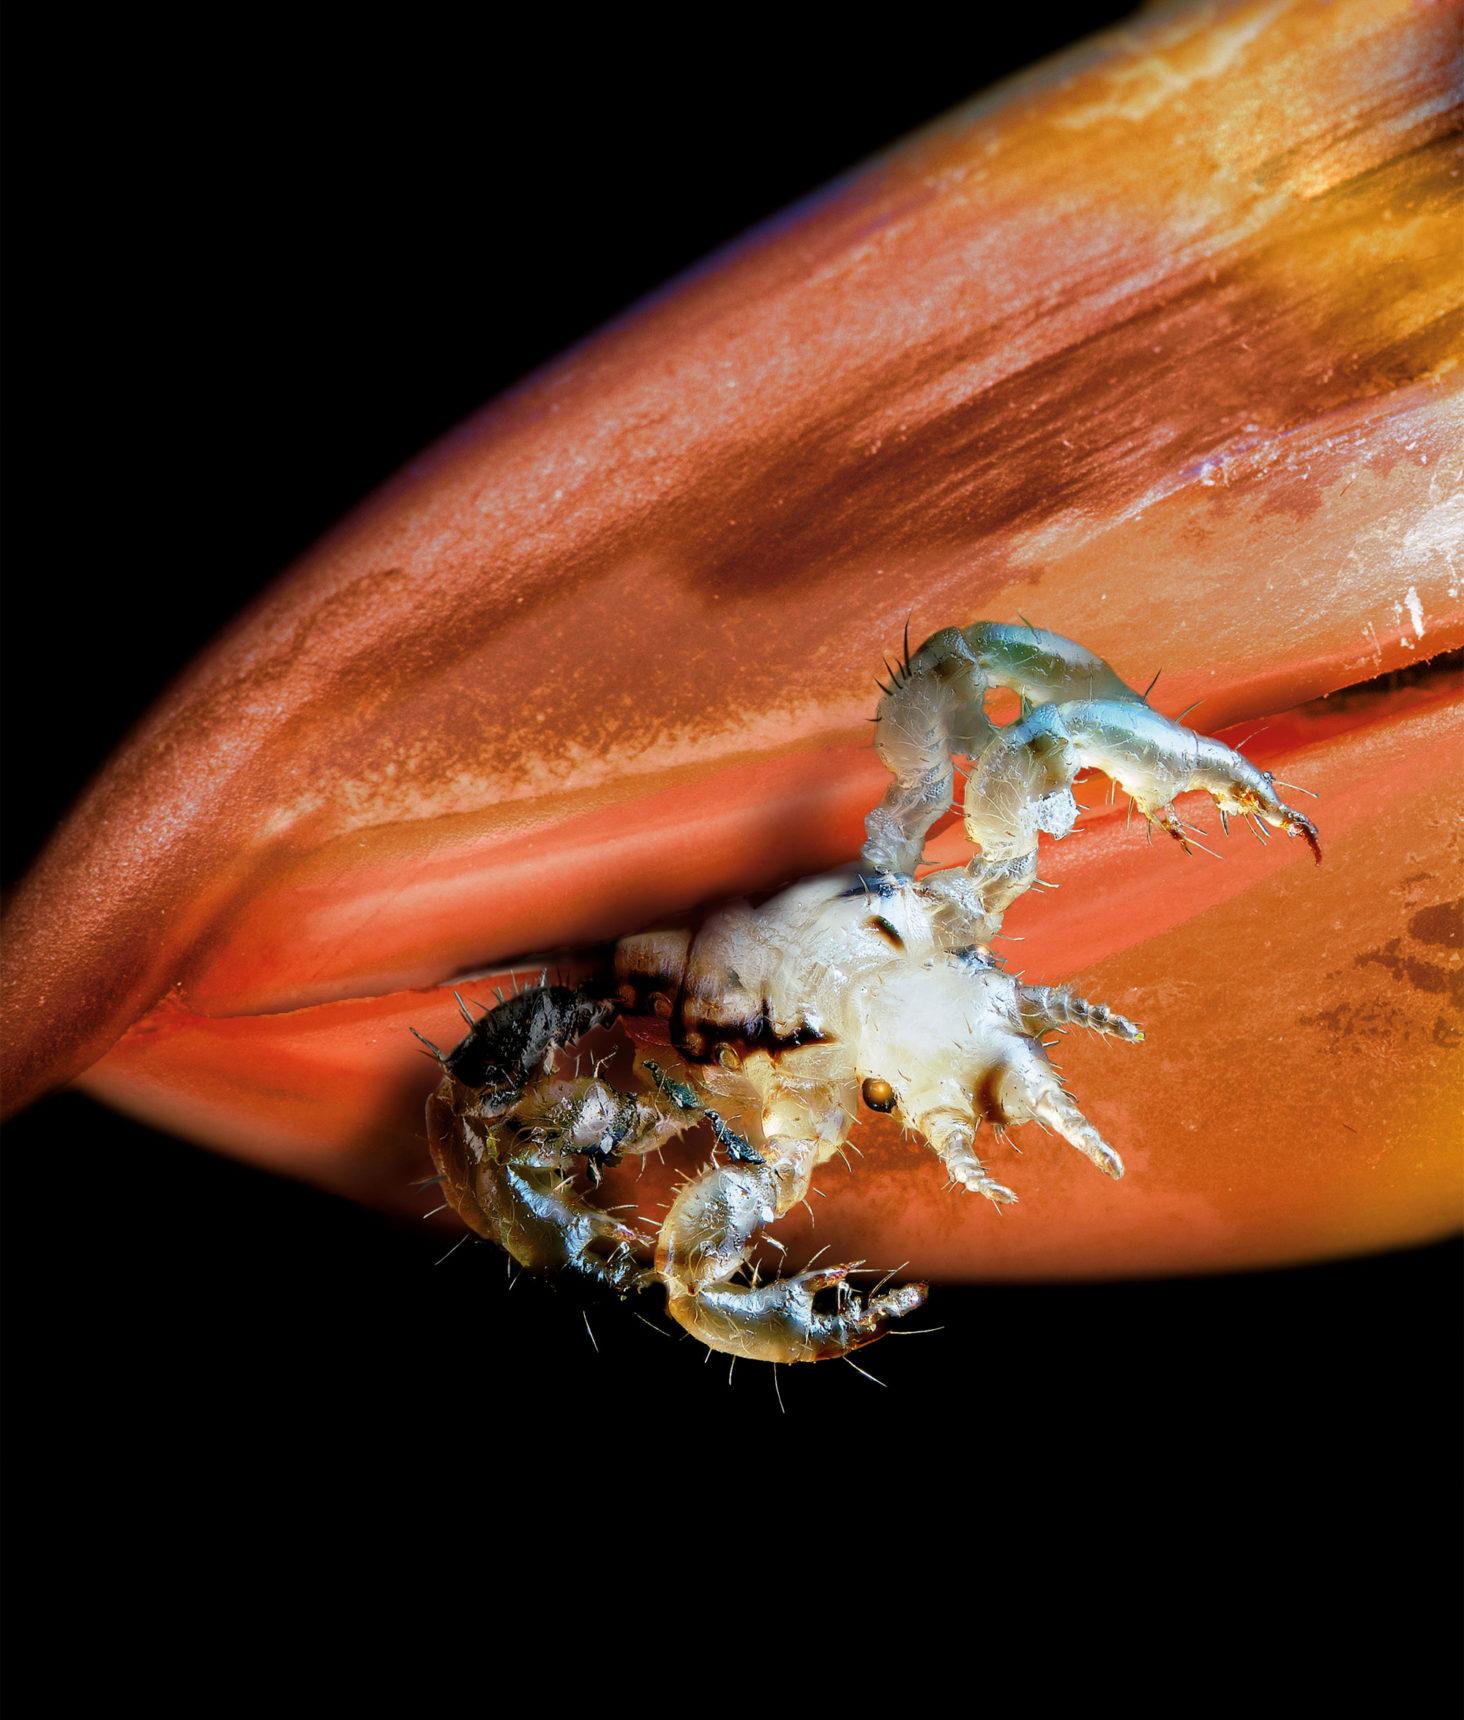 A louse in a bird's beak